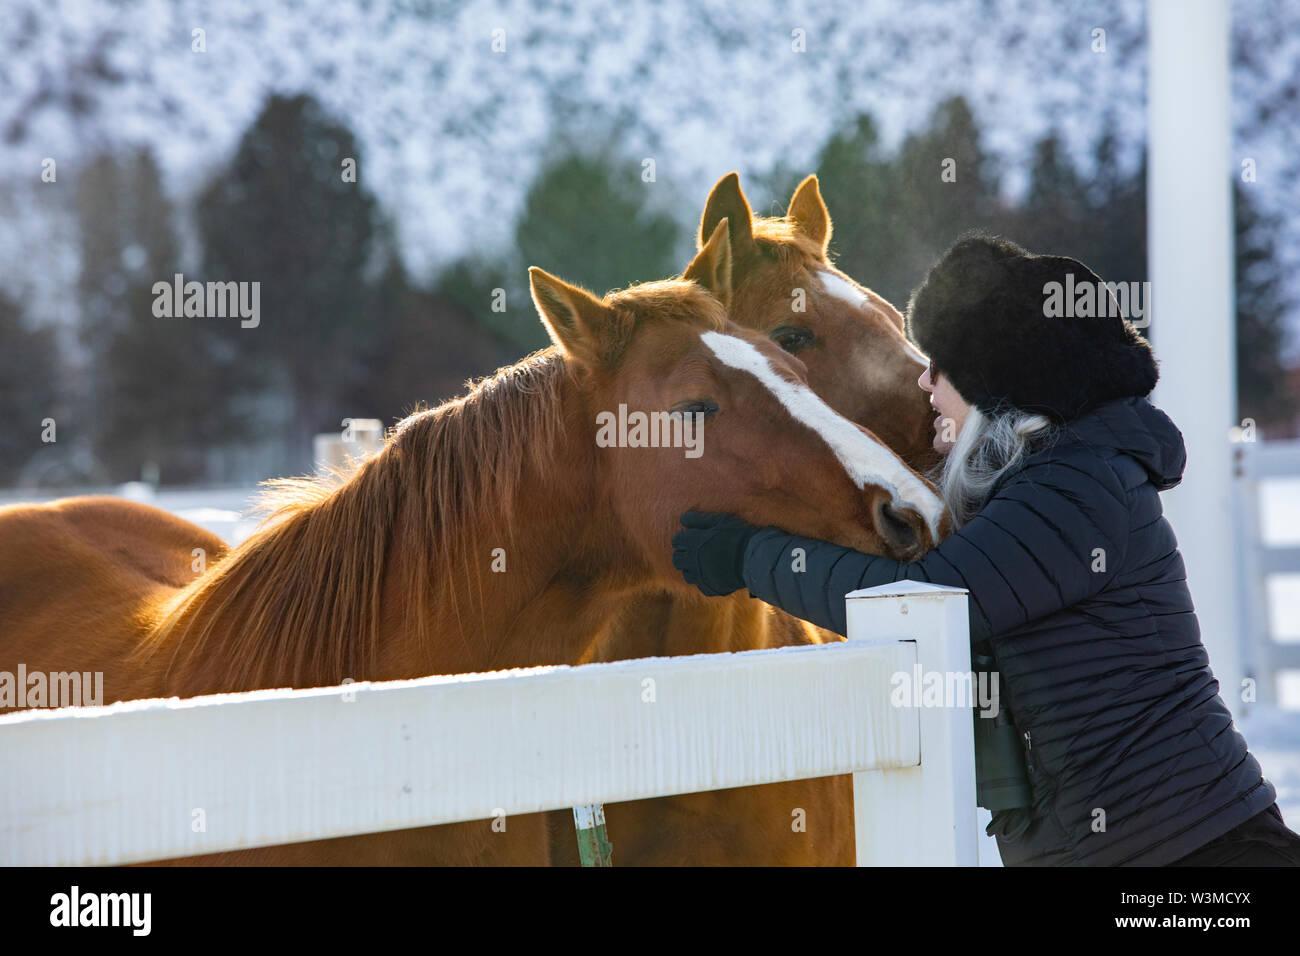 Woman wearing fur hat stroking horses - Stock Image